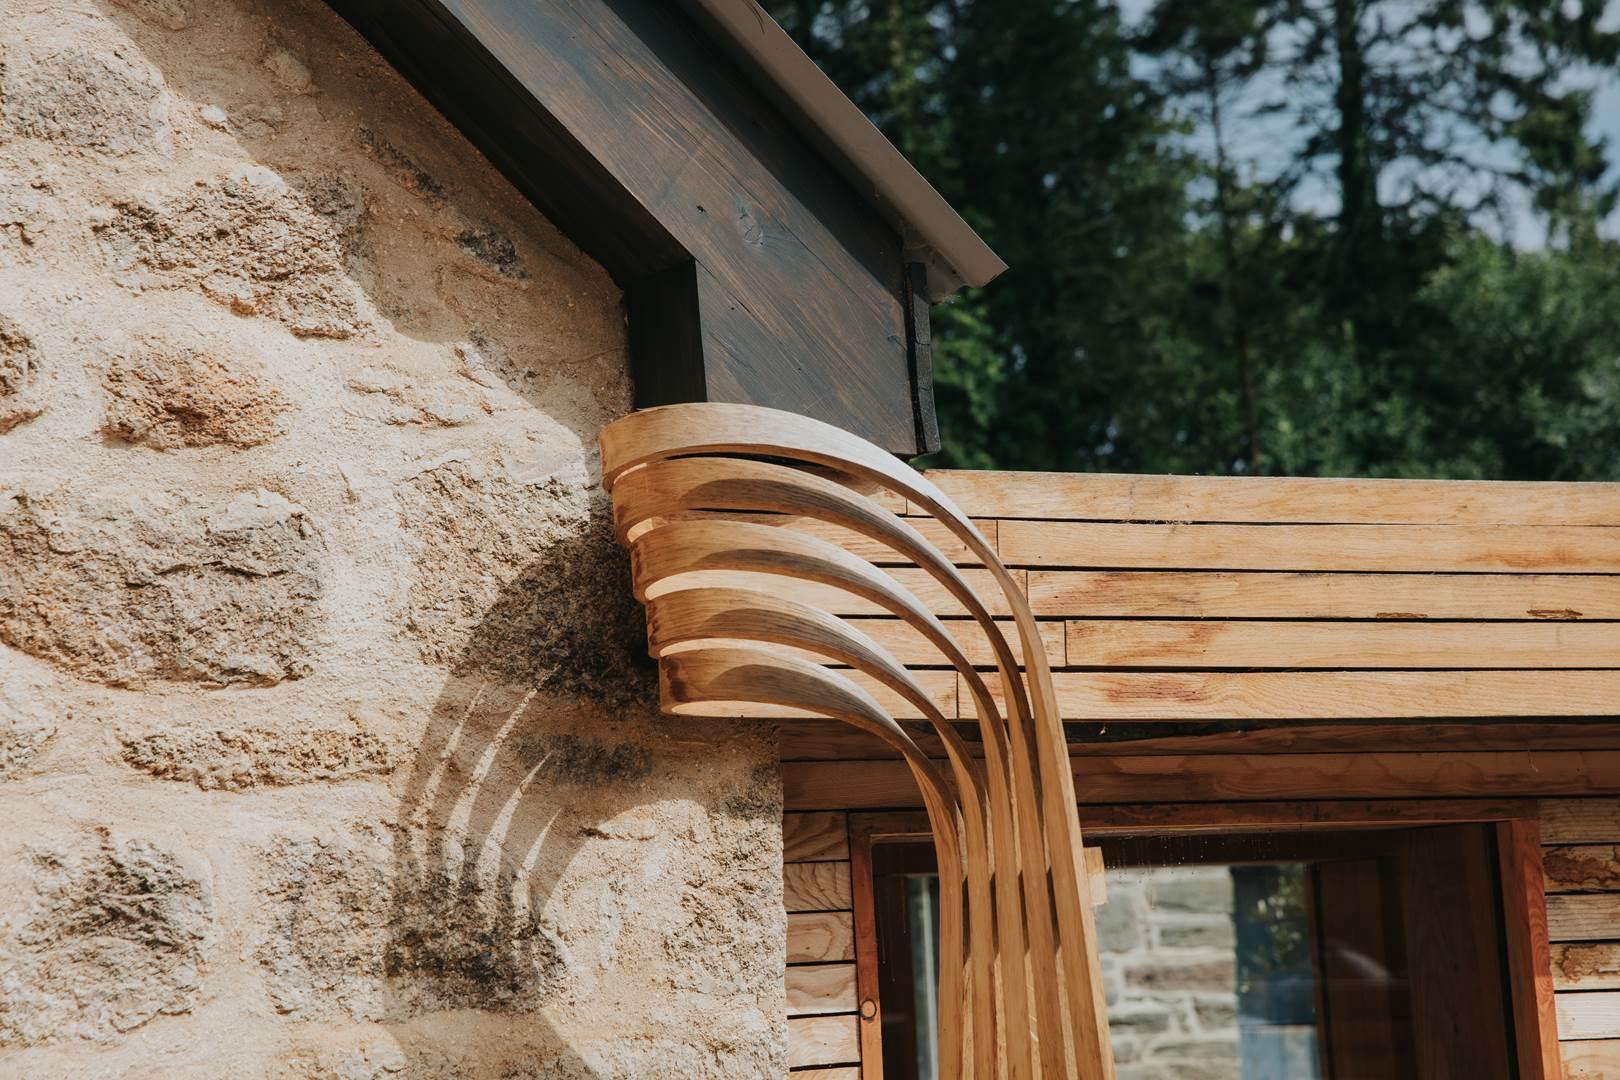 048-tom-raffield-grand-designs-house (Copy)